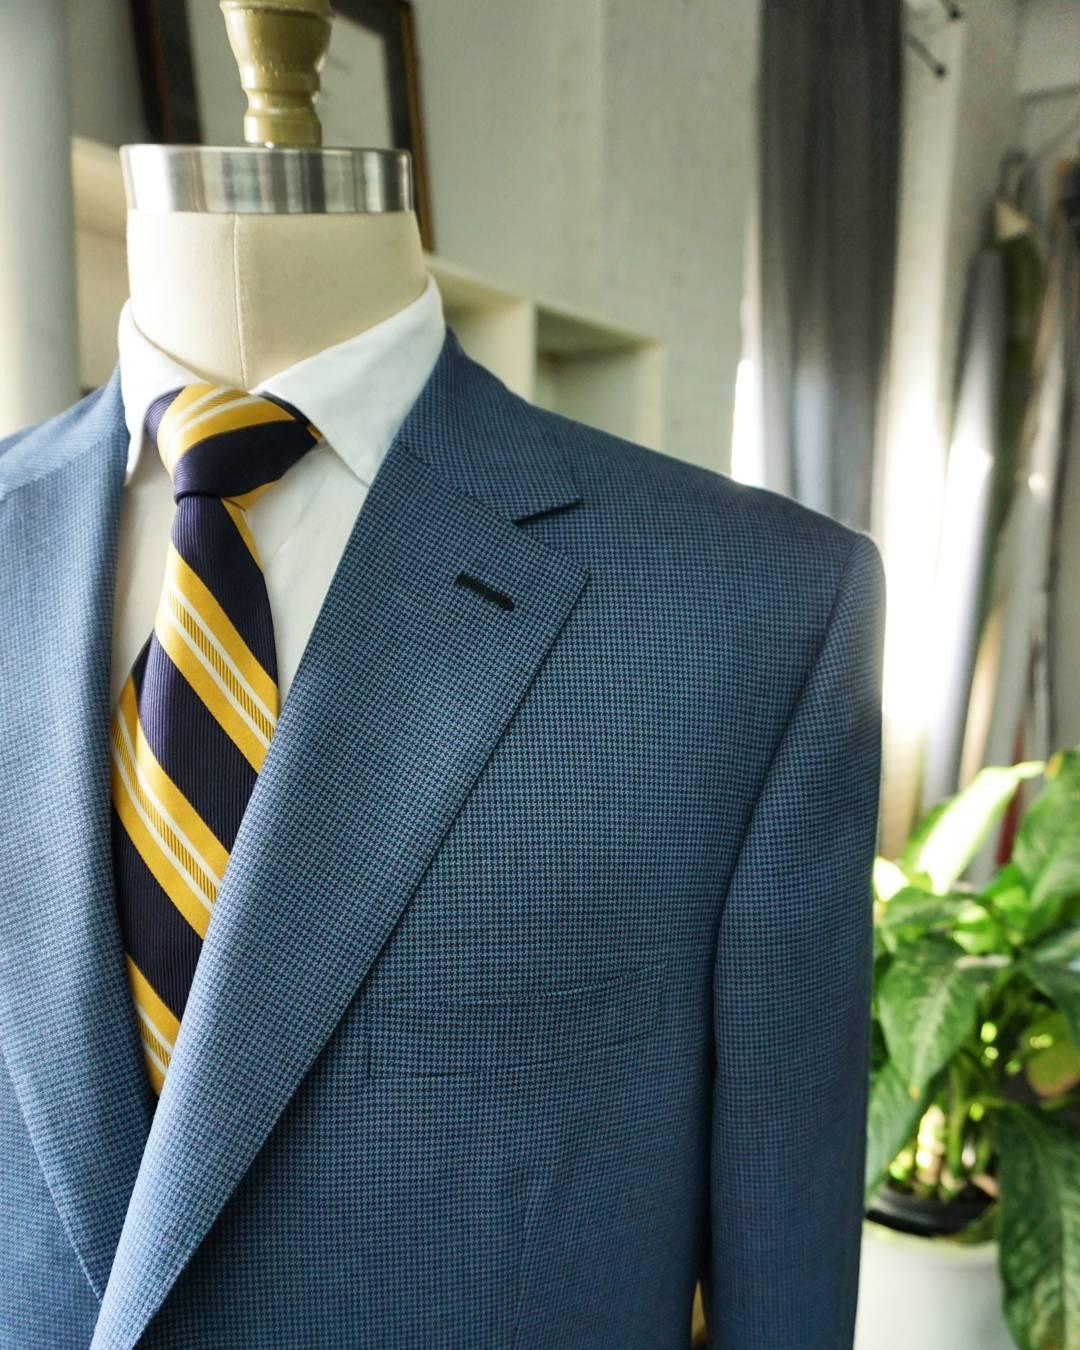 genuardi_tailor__houndstooth_custom_sport_jacket.jpg